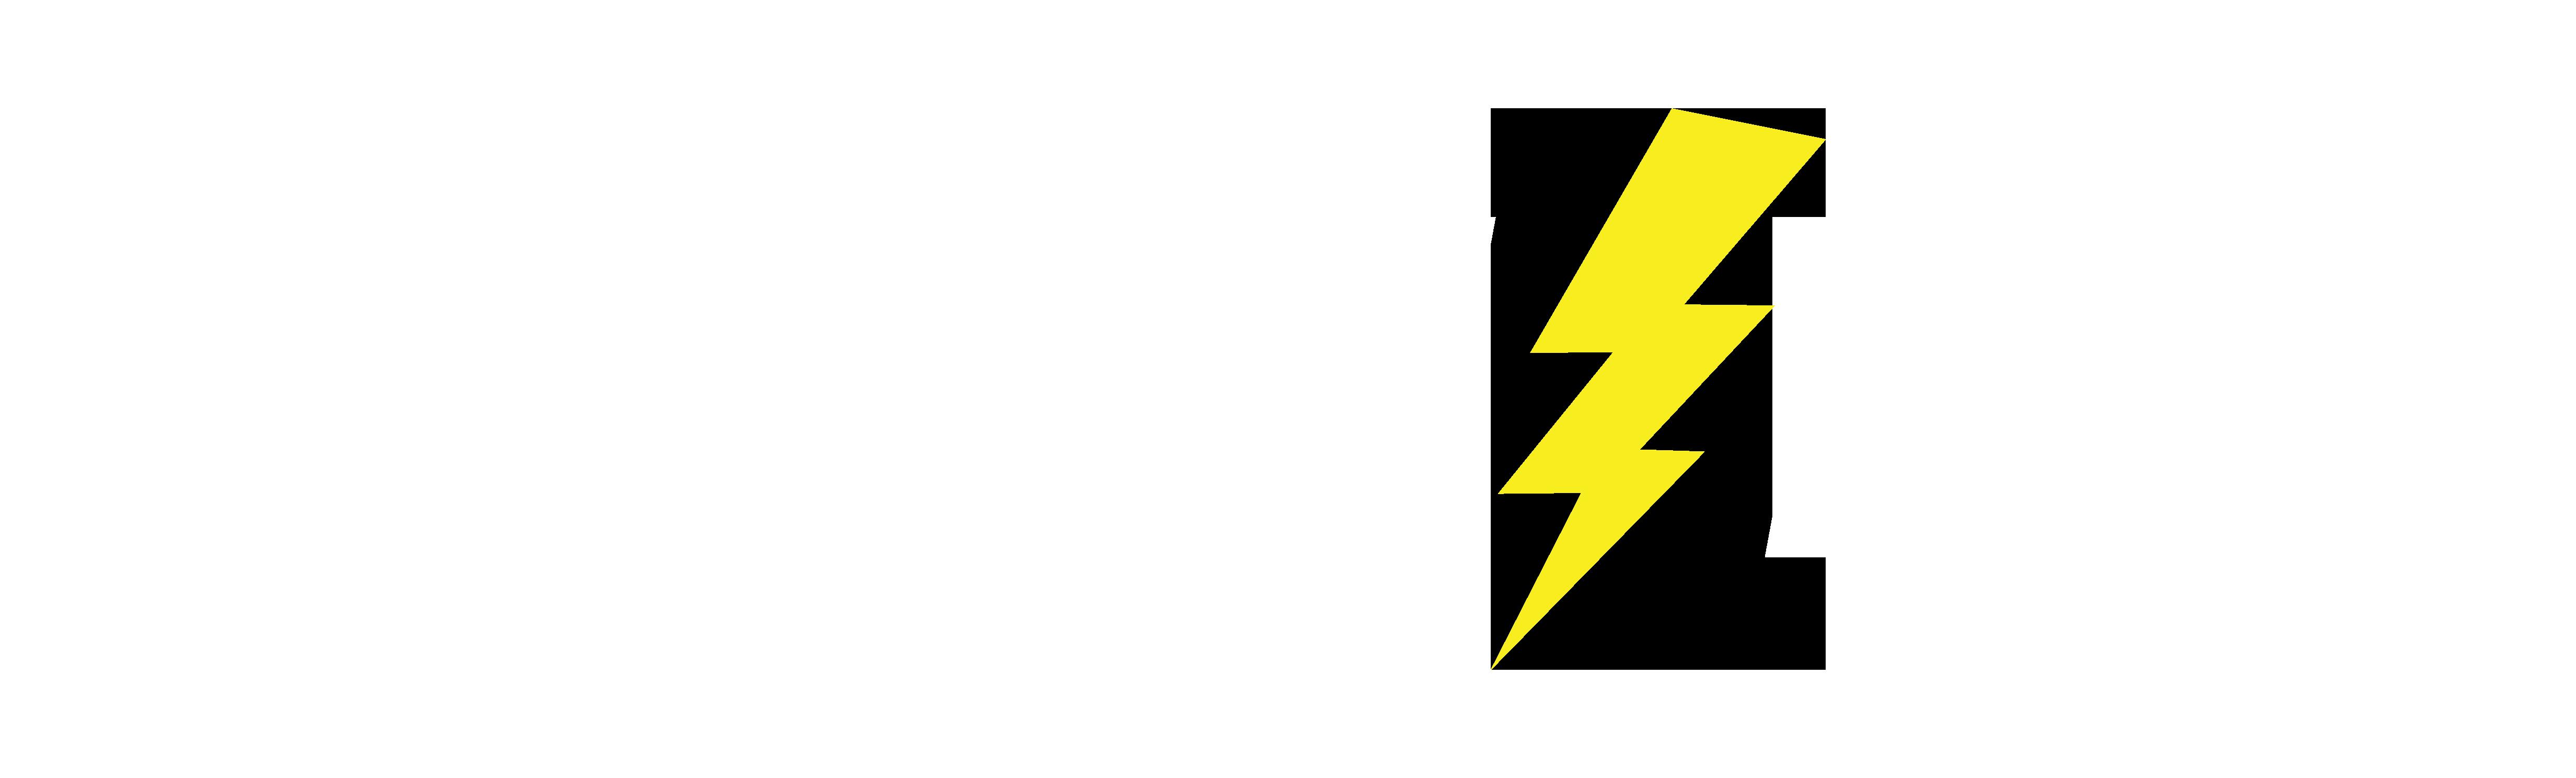 logo para anime